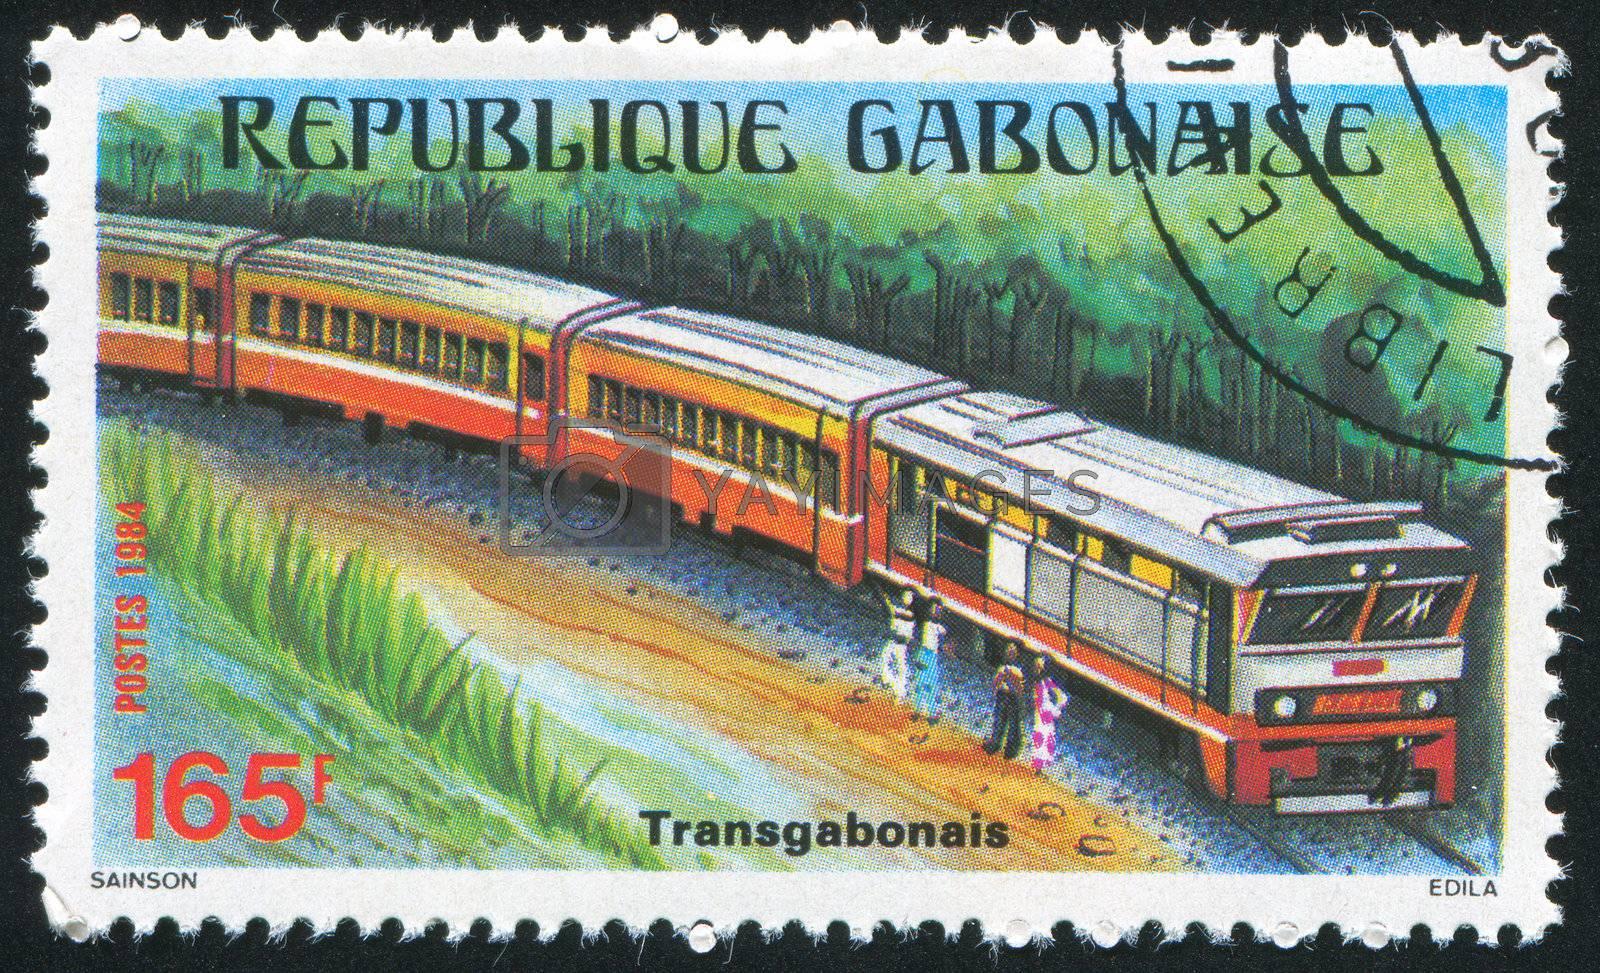 GABON - CIRCA 1984: stamp printed by Gabon, shows locomotive, circa 1984